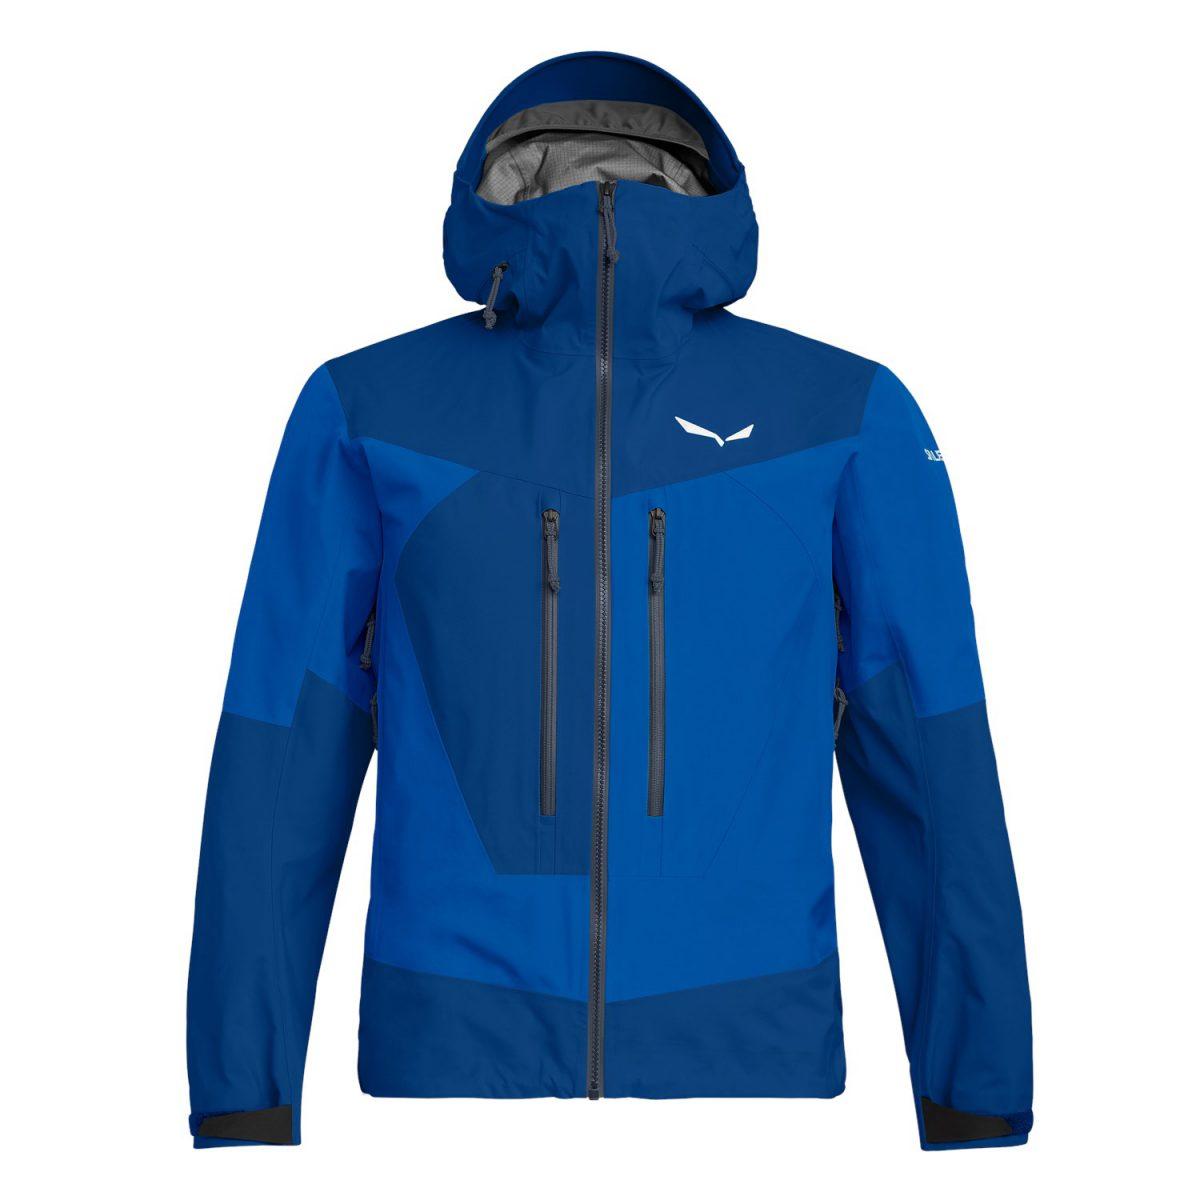 ORTLES 3 GORE-TEX PRO waterproof man jacket blue for winter season in the alps